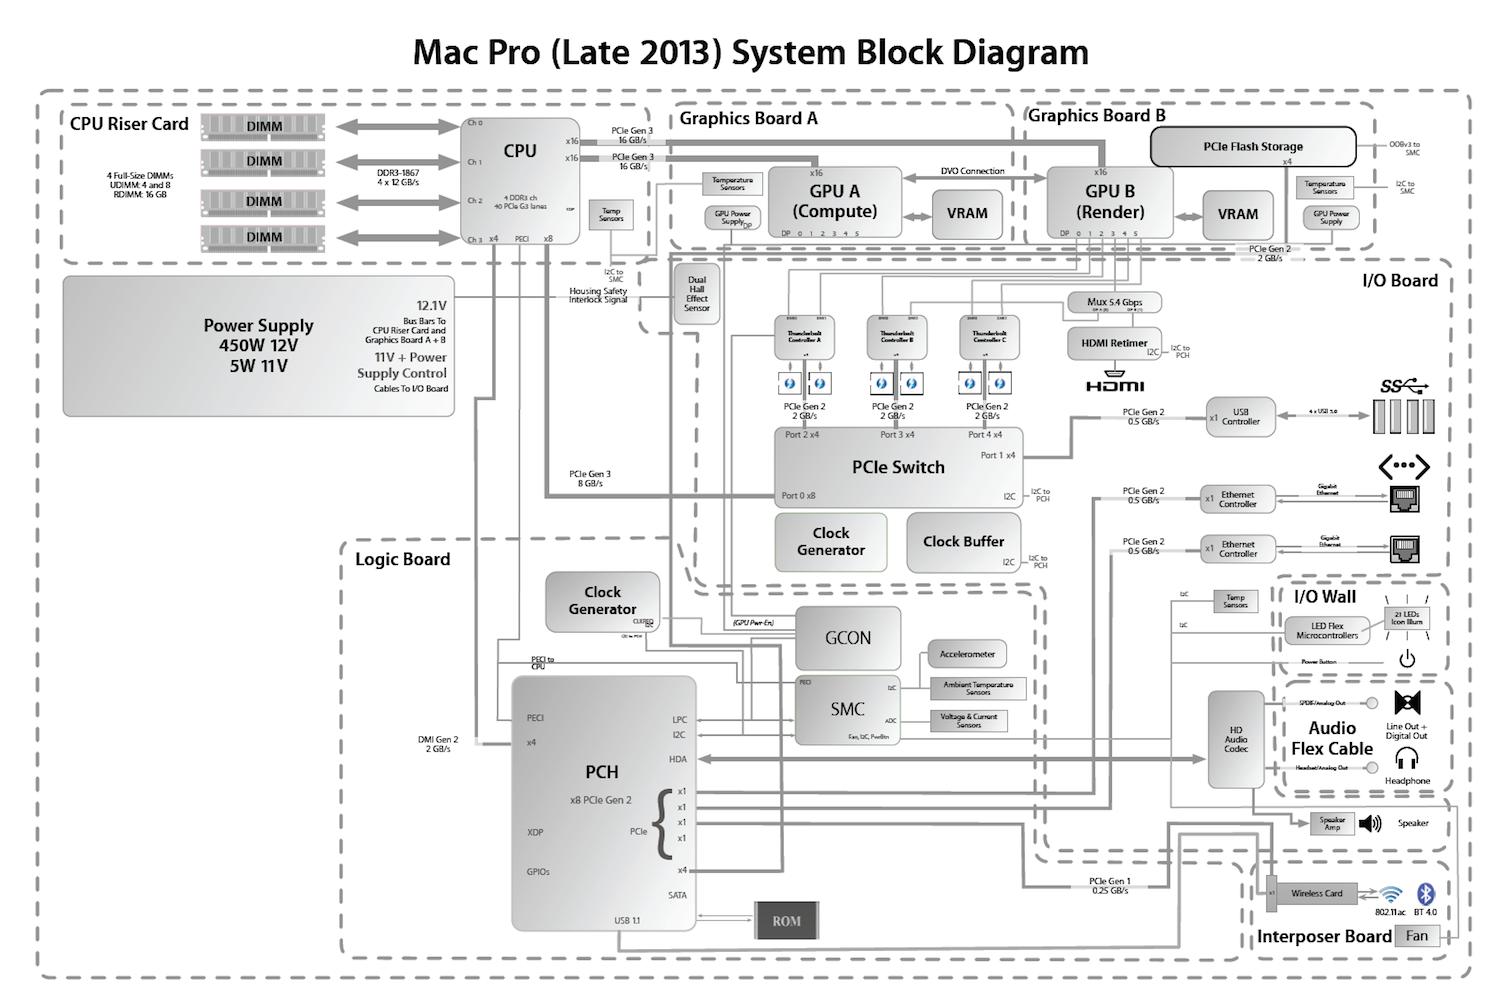 late-2013-mac-pro-system-block-diagram.png